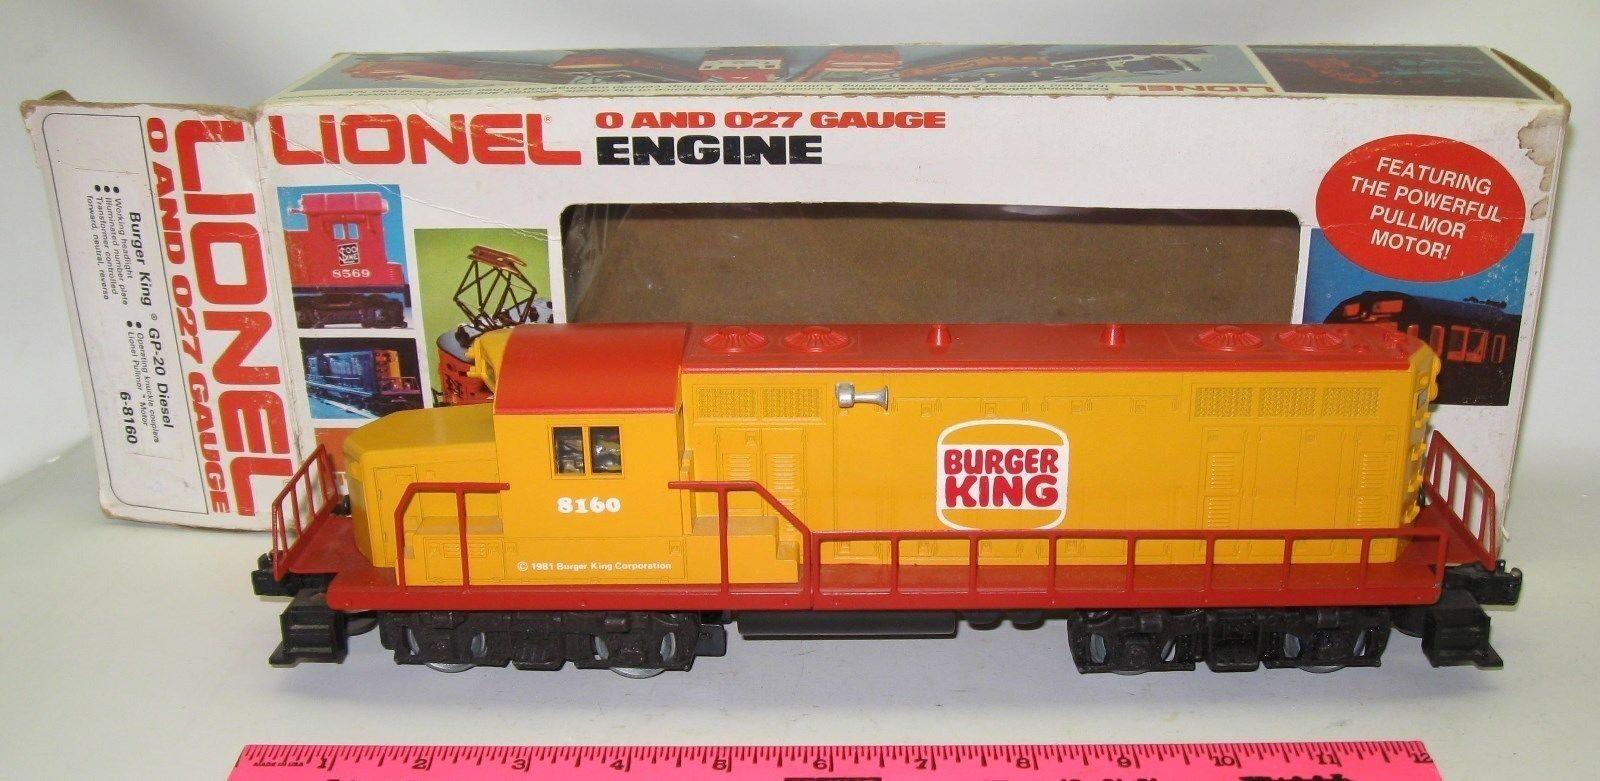 Lionel 6-8160 Burger King Gp-20 Diesel